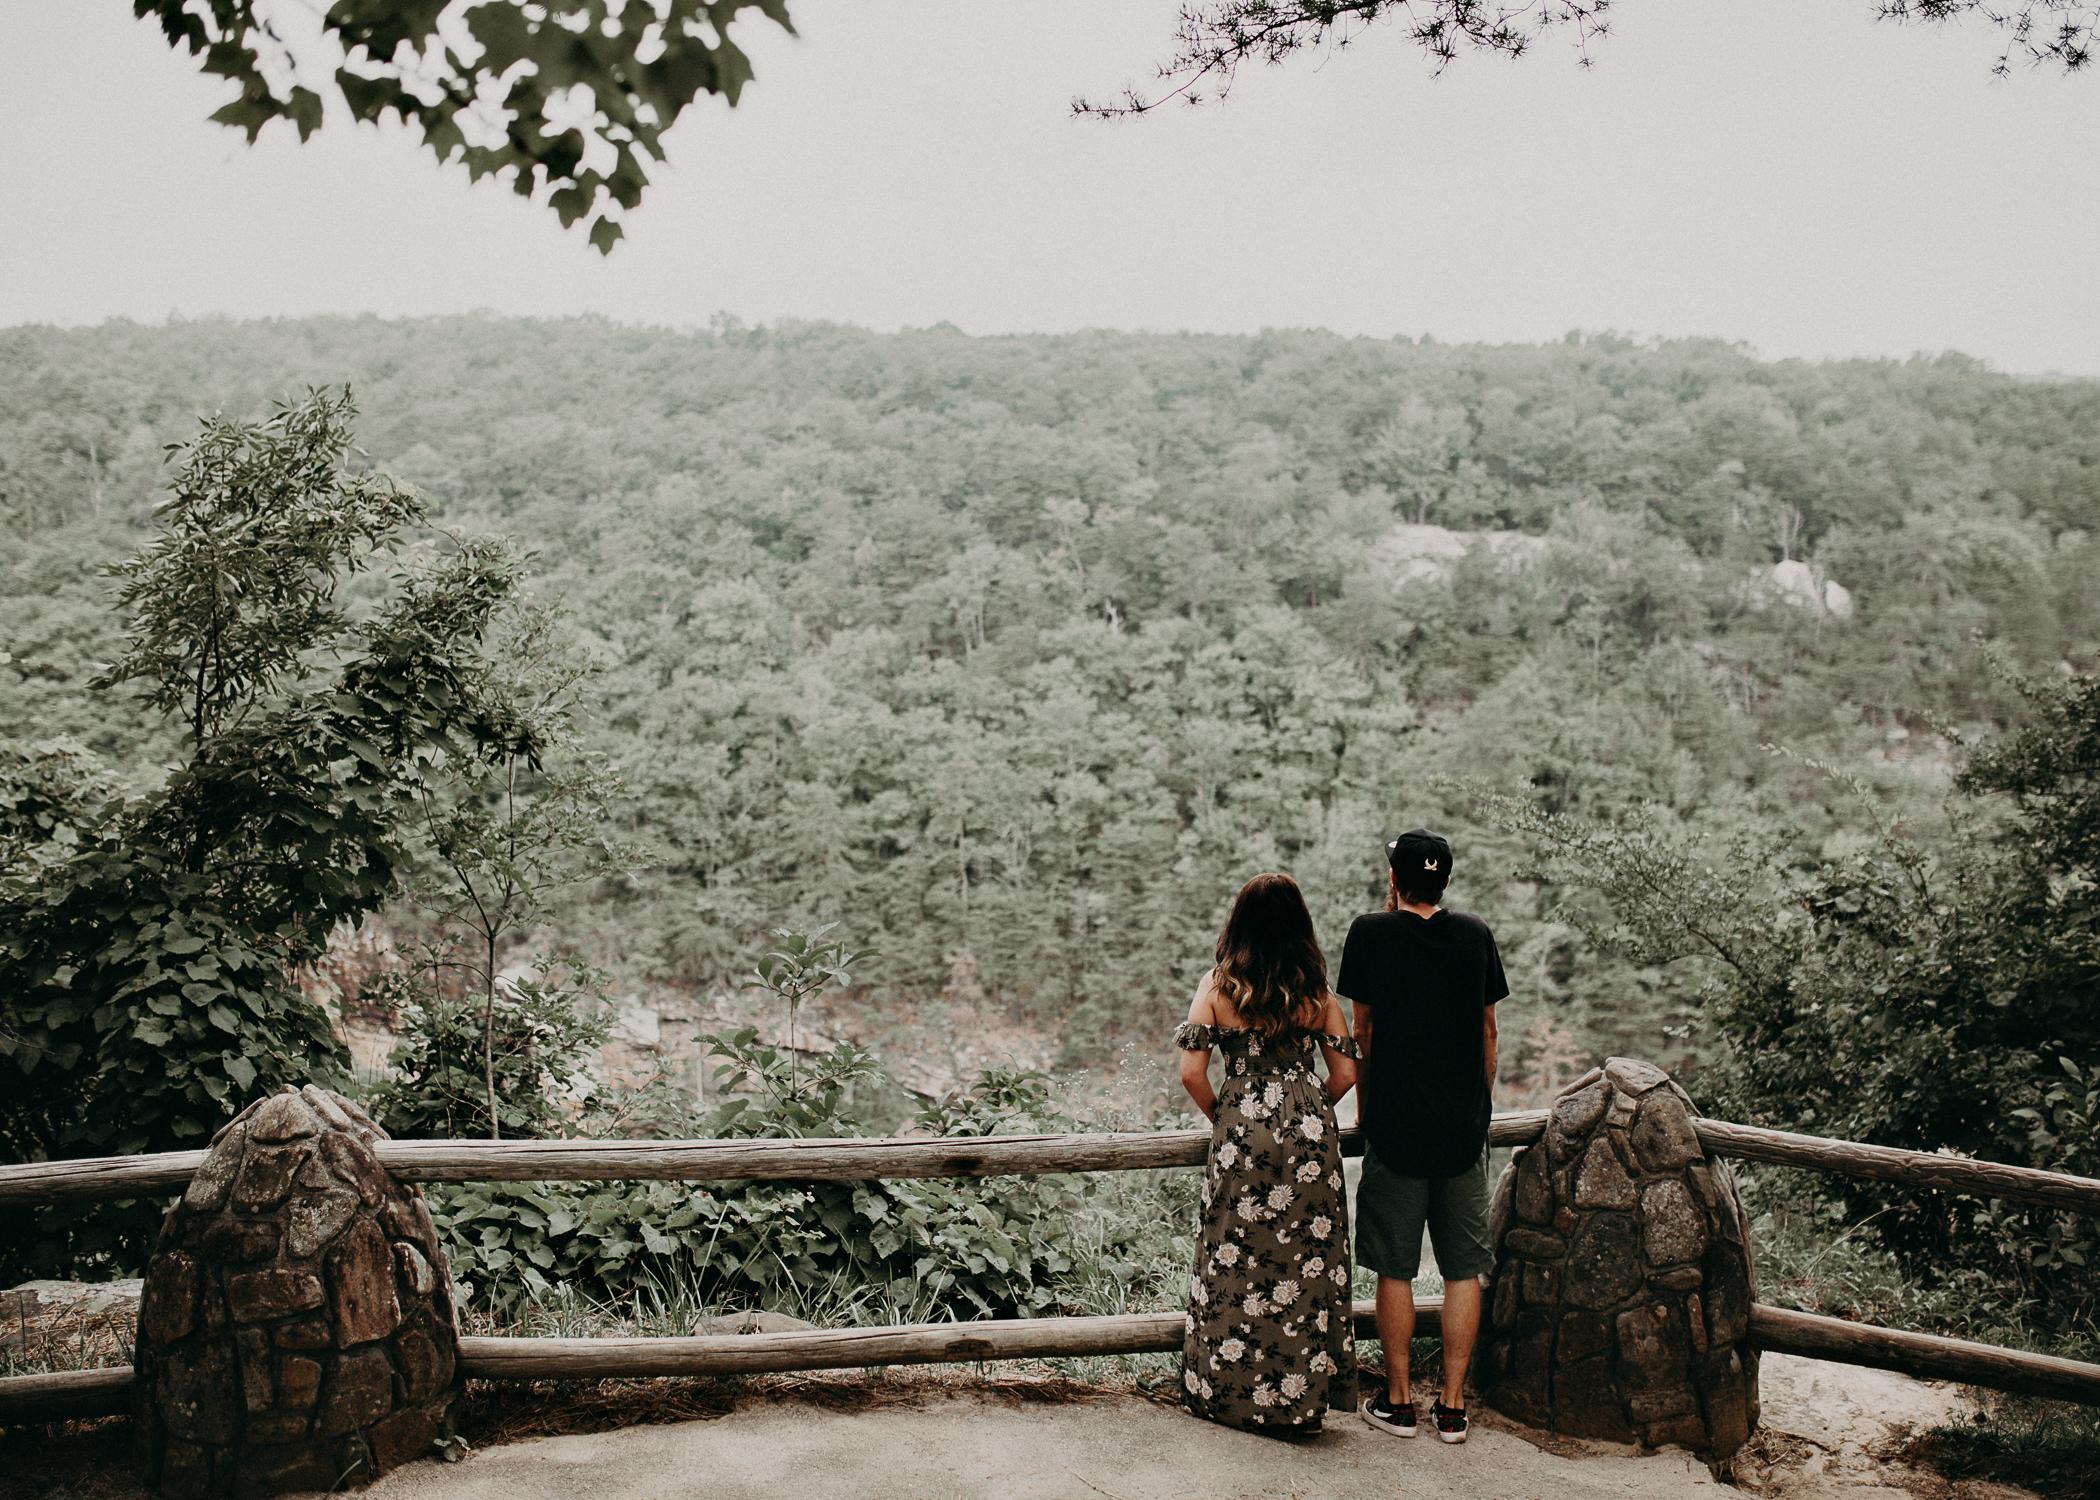 Cloudland canyon, whaterfall georgia, couples waterfall engagement 1.jpg